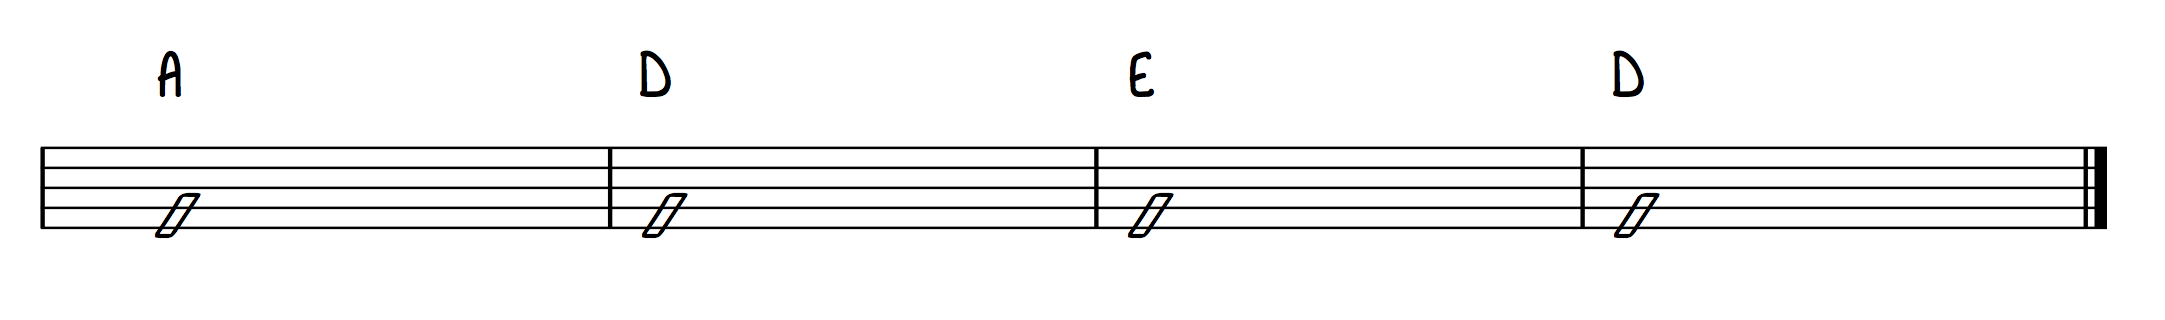 Chord Progression ADED